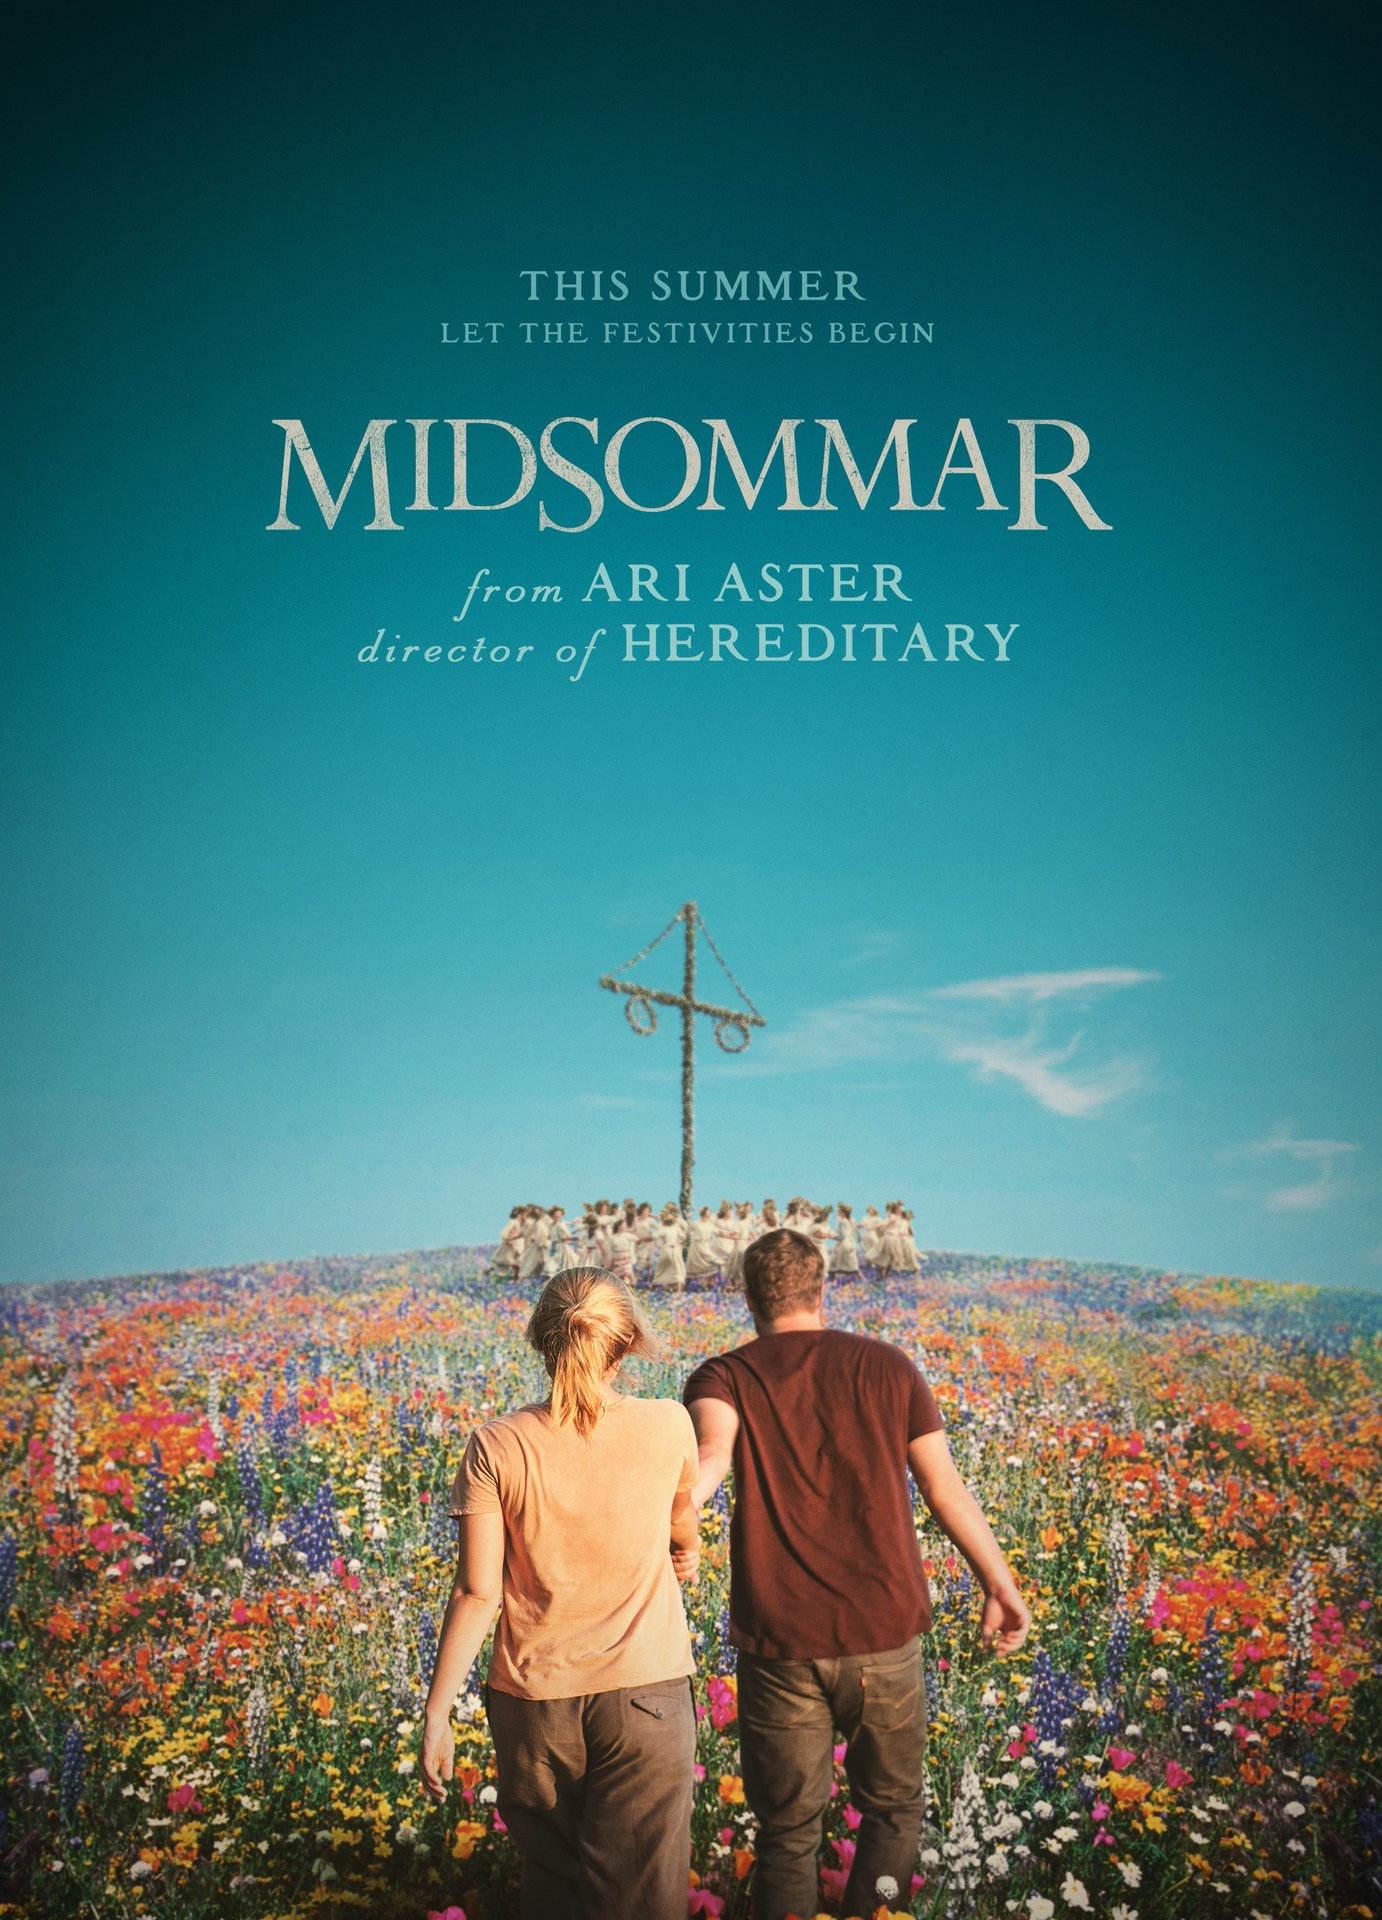 midsommar-poster.jpg